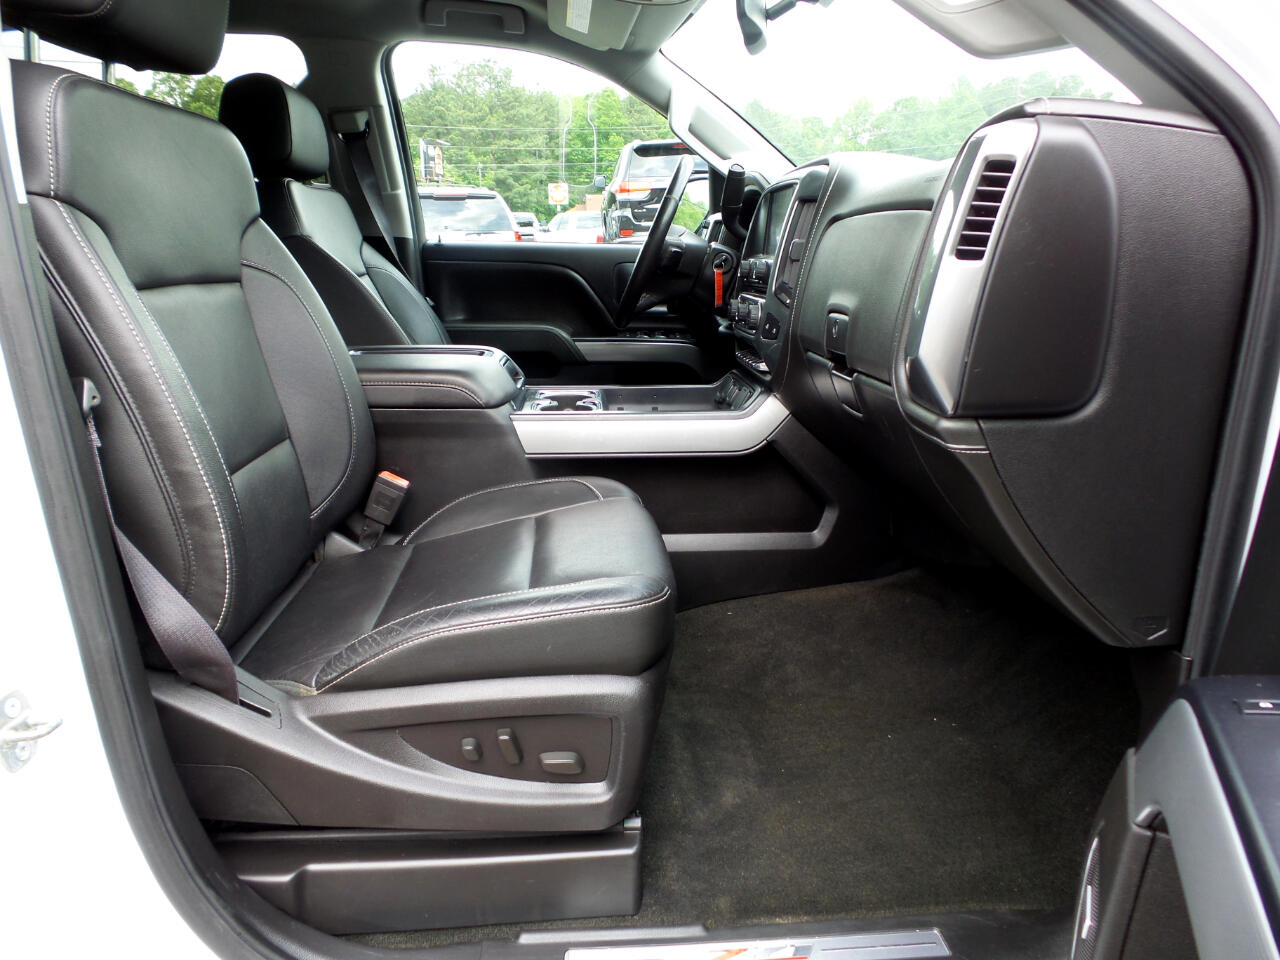 2015 Chevrolet Silverado 2500HD LTZ Crew Cab Long Box 4WD